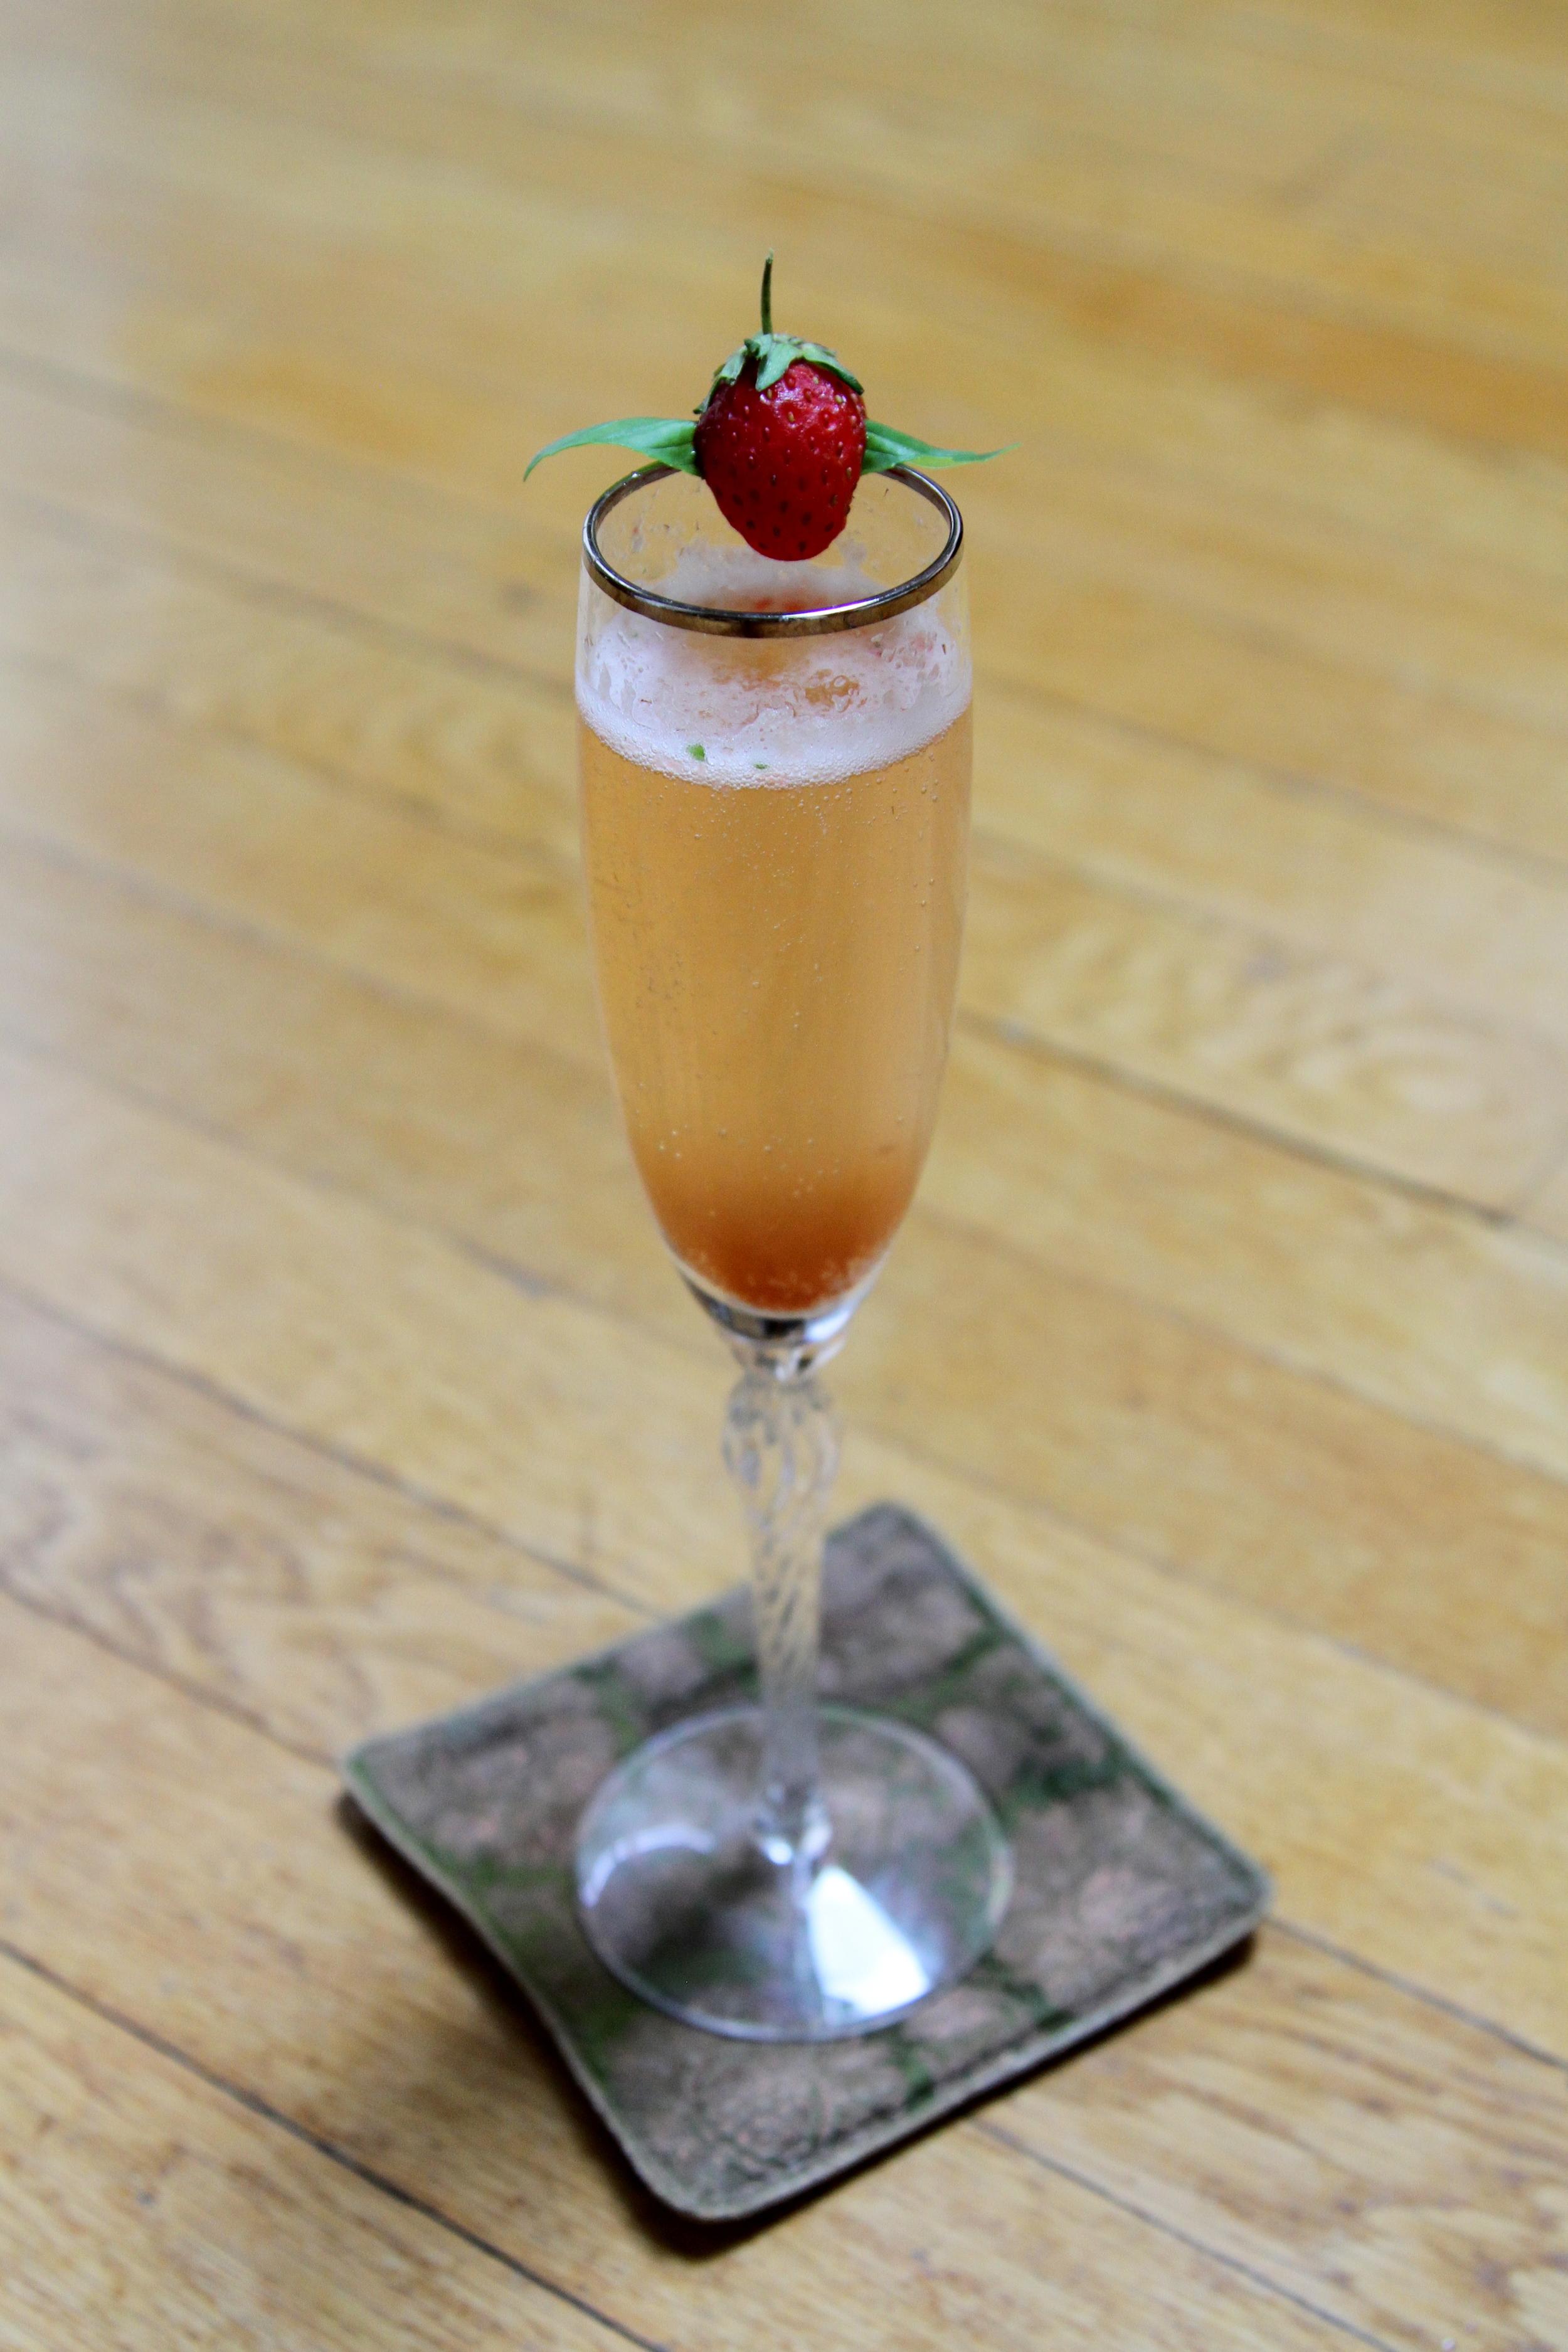 Strawberry, Rhubarb & Basil Prosecco